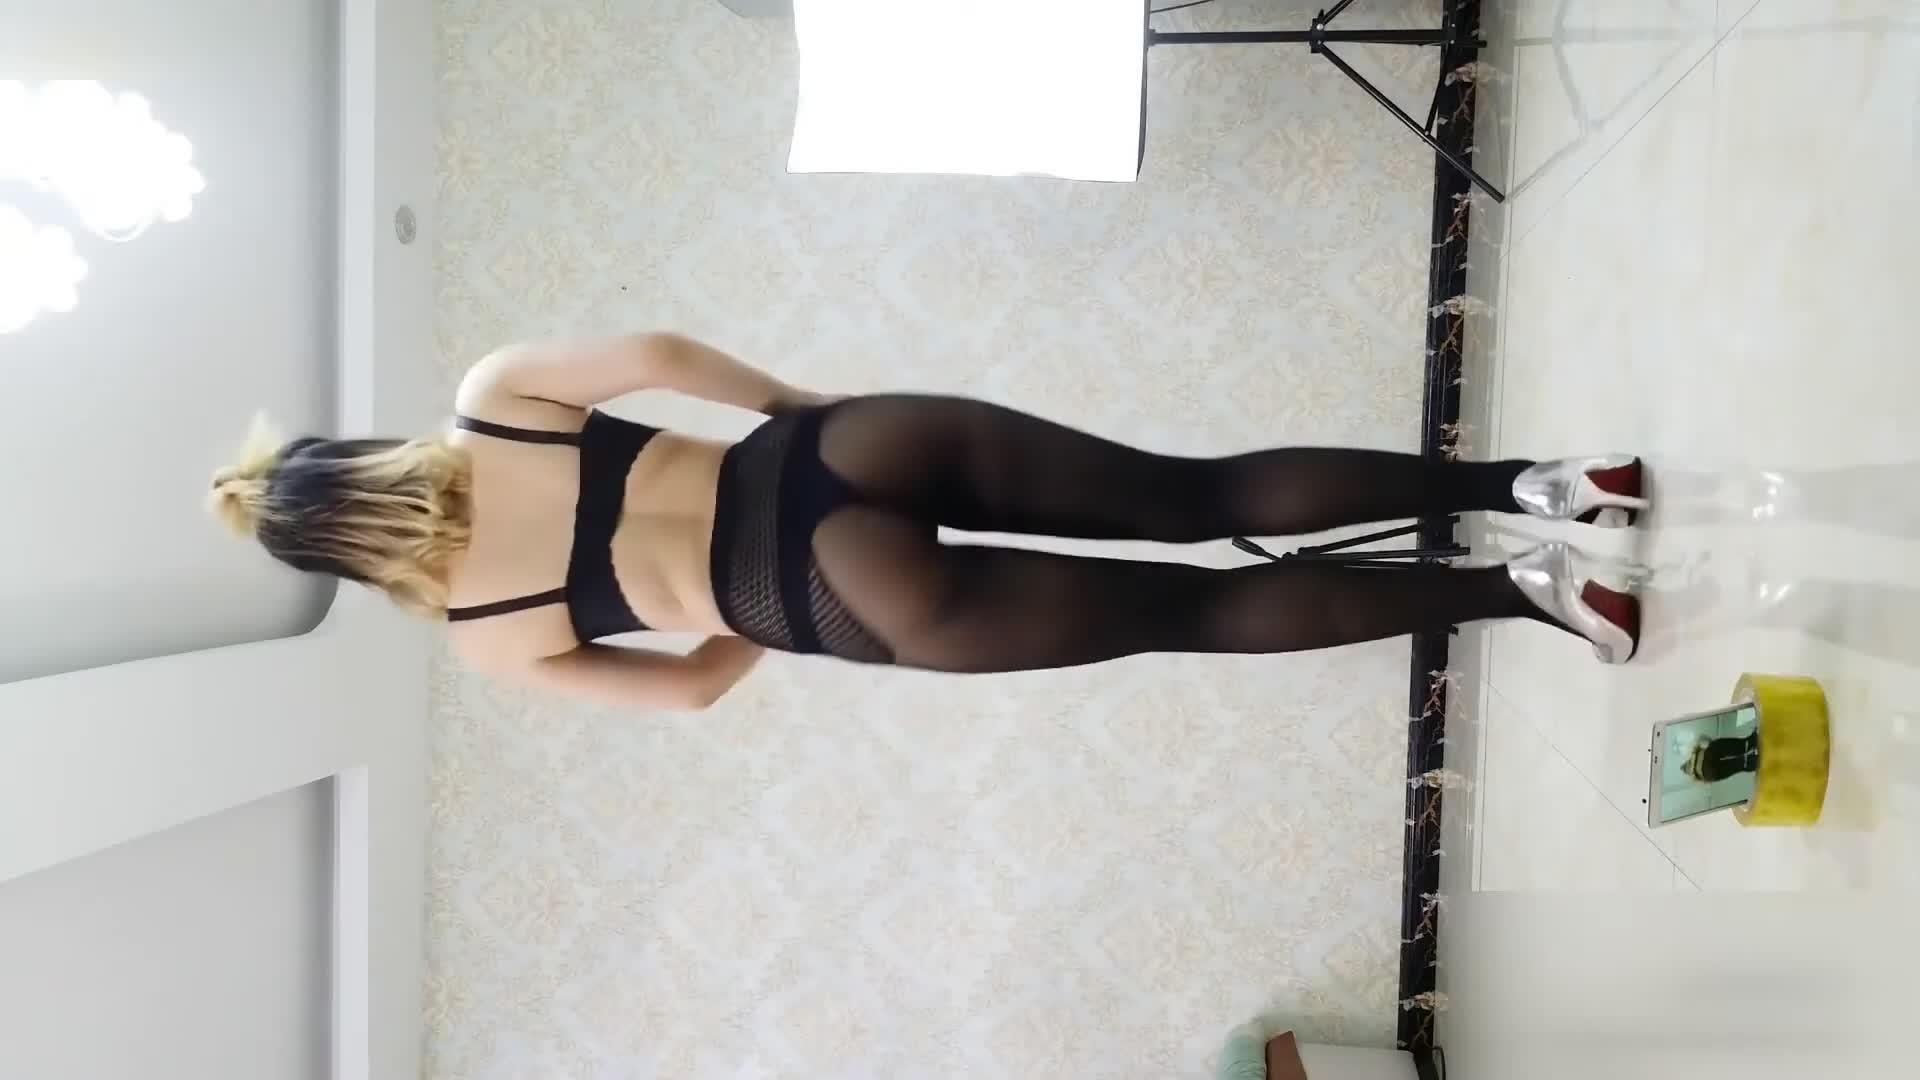 Sexy Dance 萱萱 黑色絲襪+黑色內衣 蜜桃臀絲襪高跟背後搖